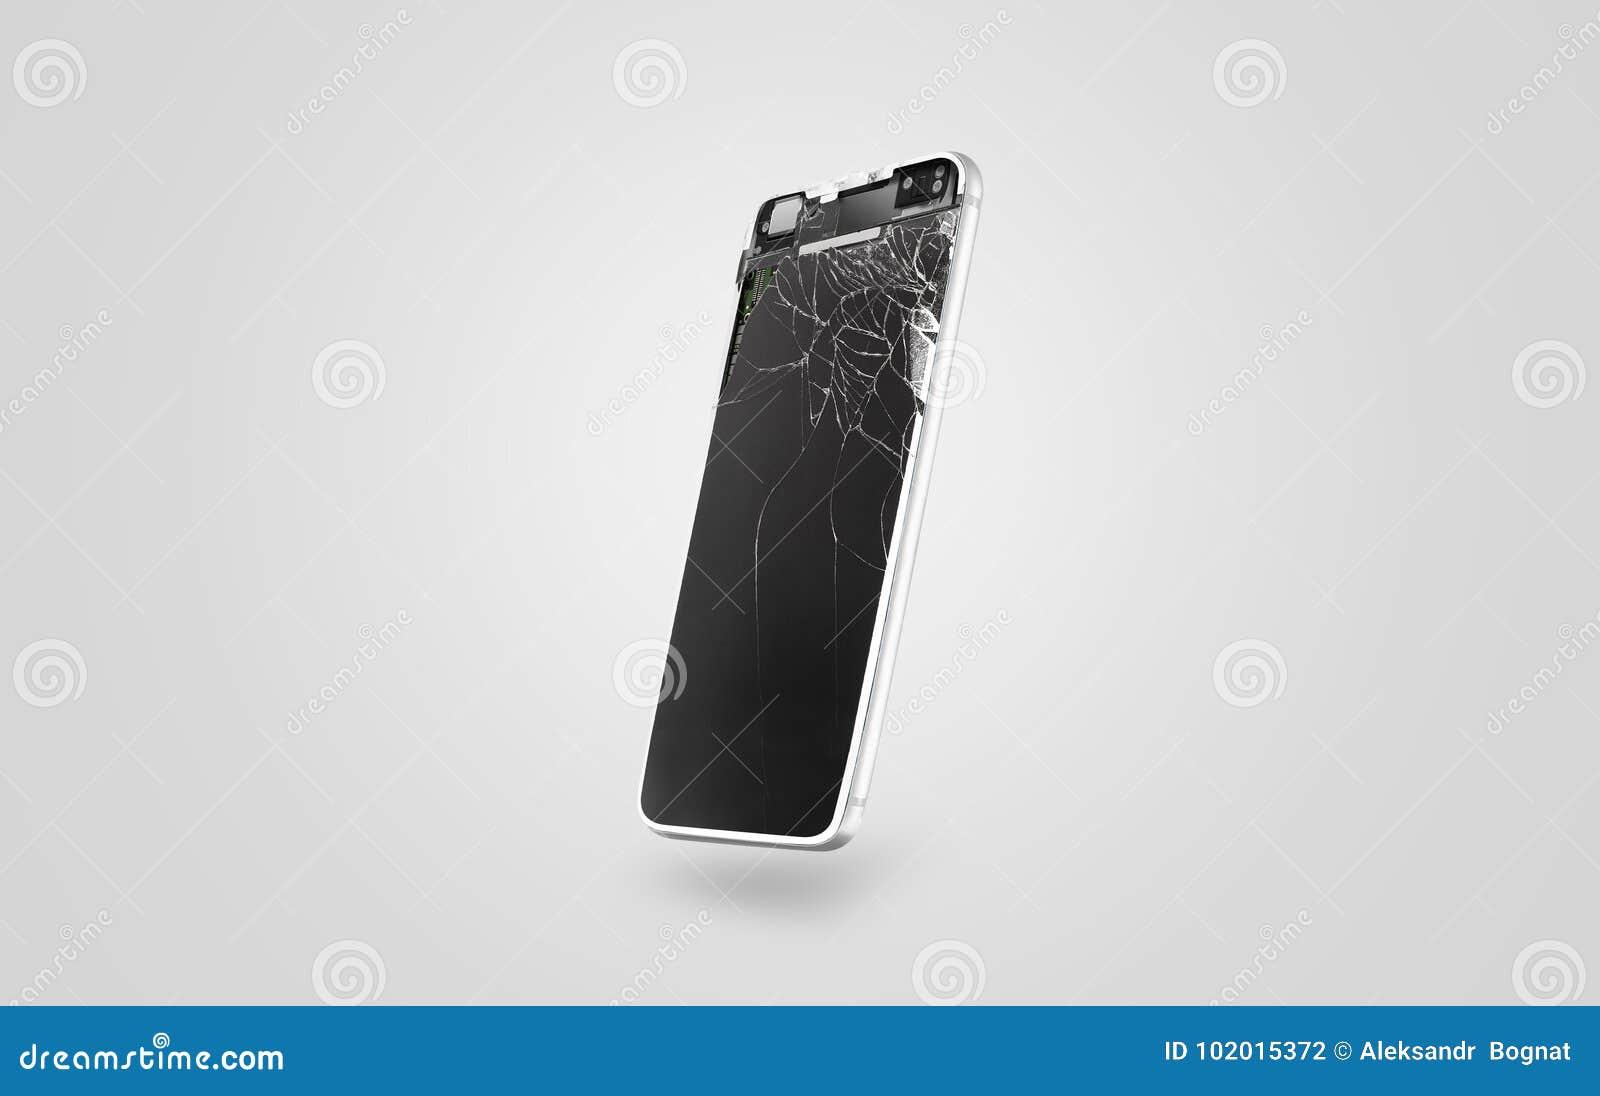 New broken mobile phone display mockup, side view